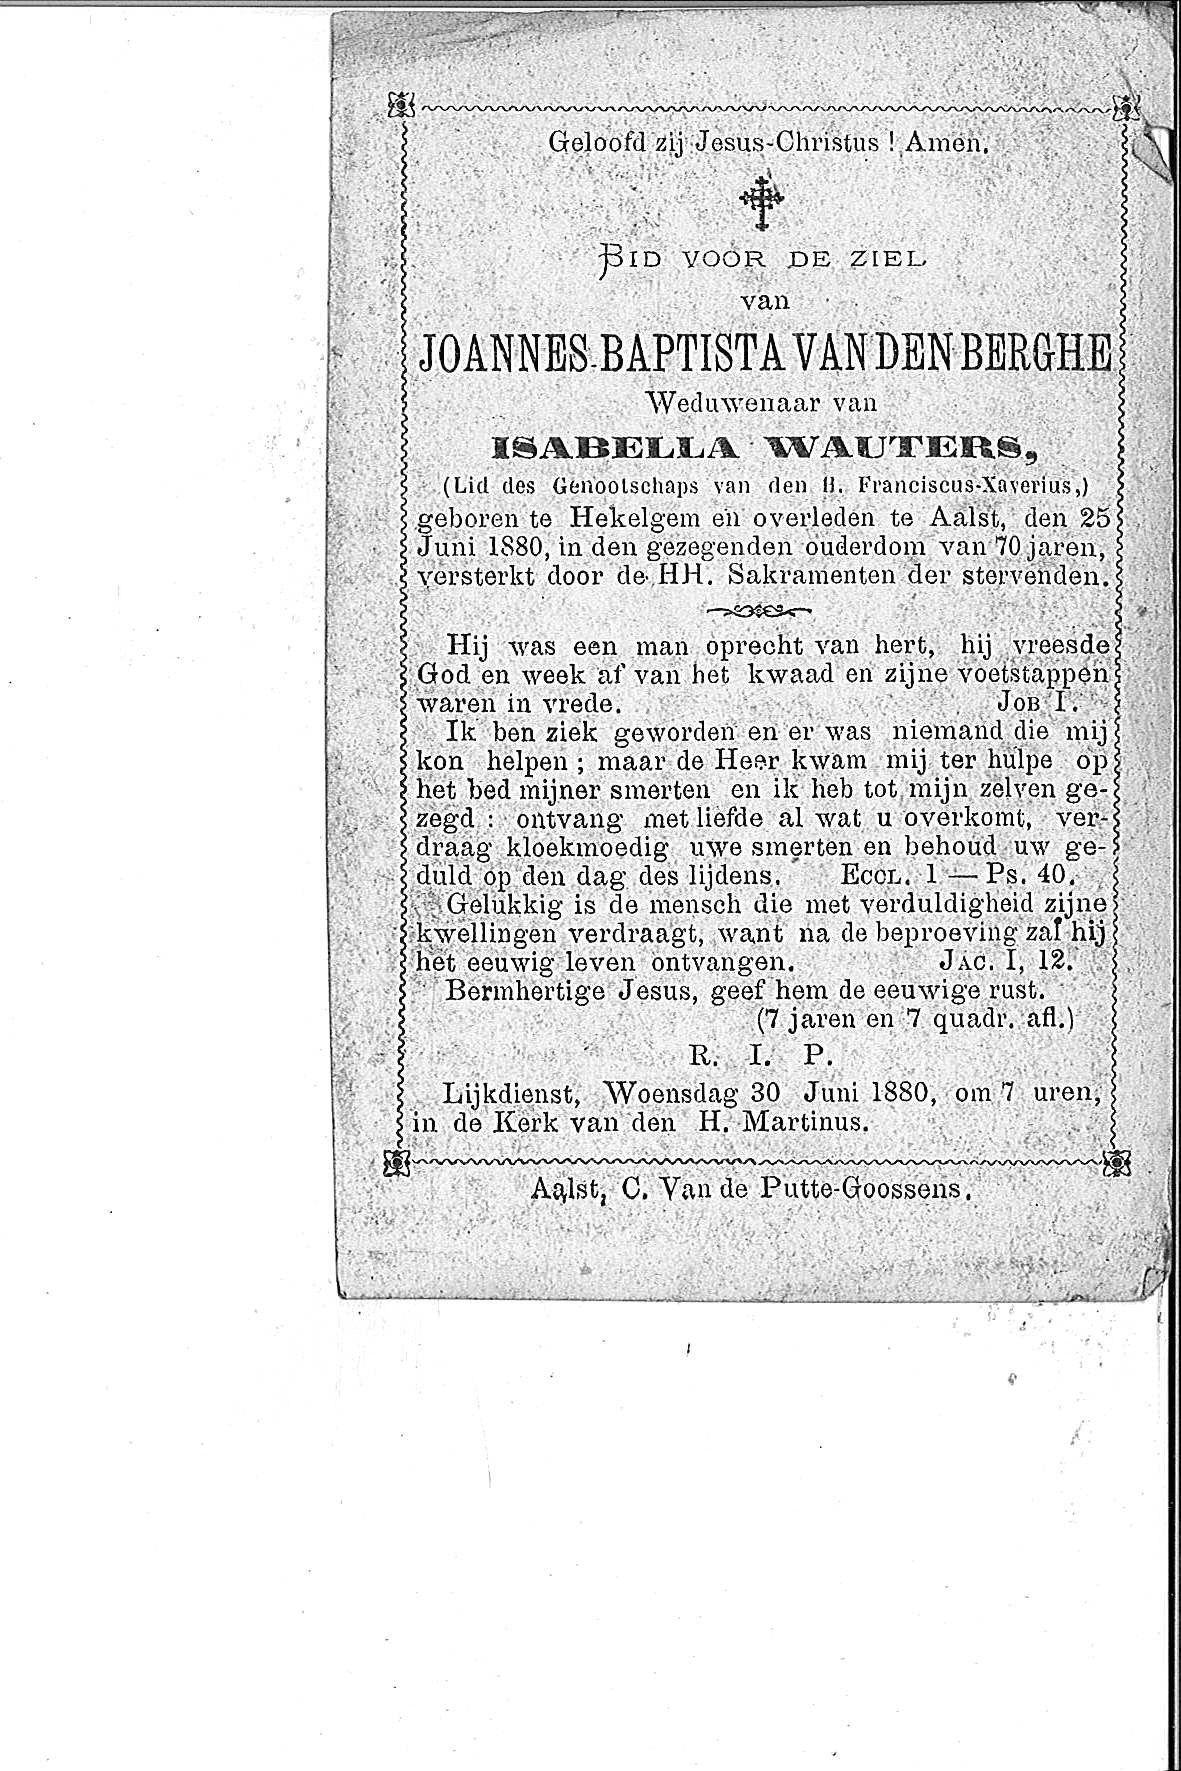 Joannes_Baptista(1880)20150810101333_00076.jpg